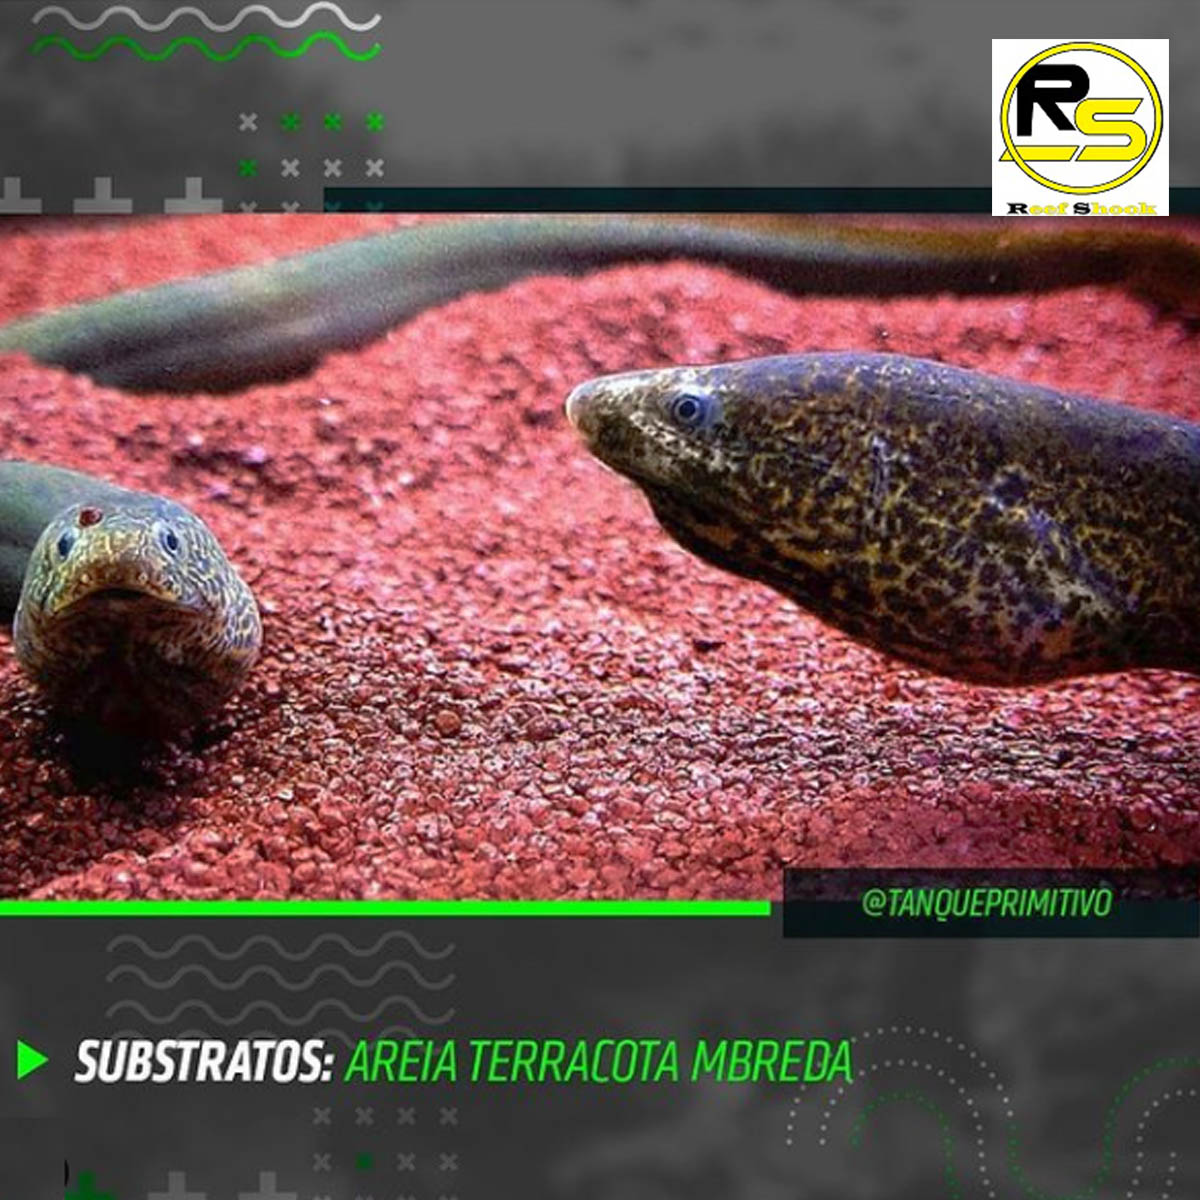 Areia Terracota Mbreda Pote 6kg Substrato para Aquarios